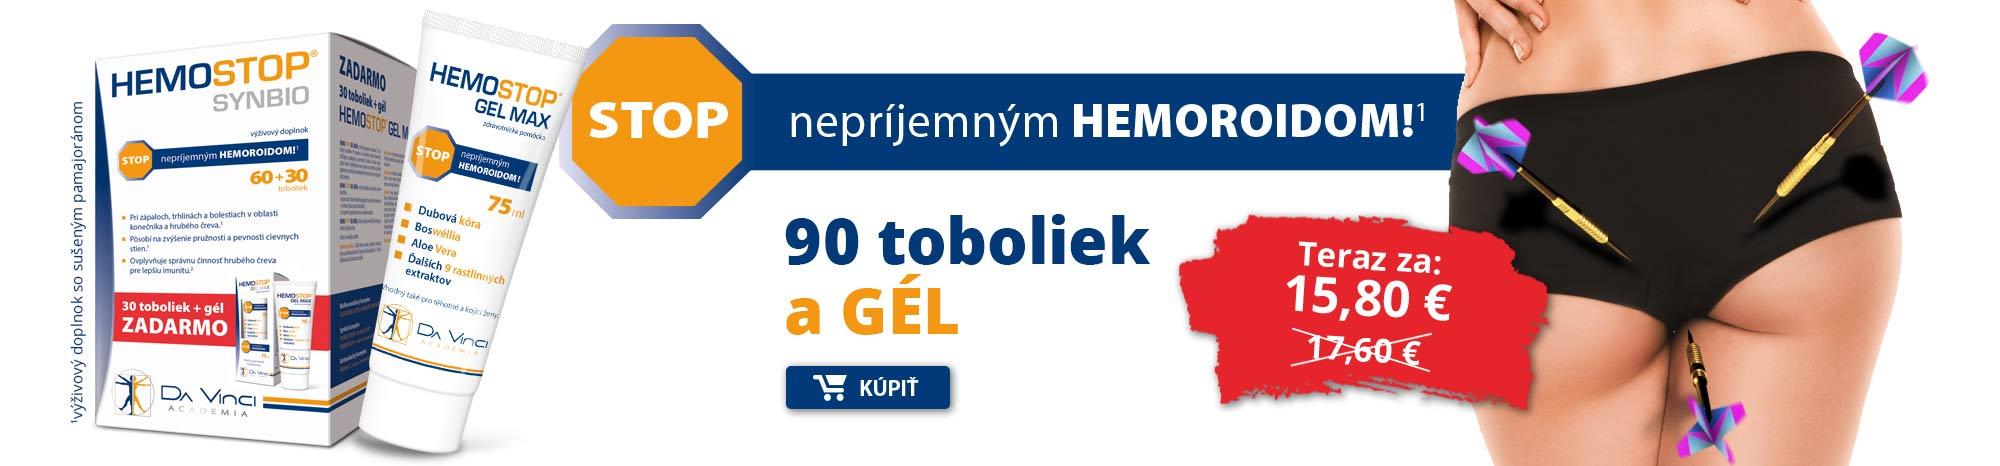 Hemostop Synbio